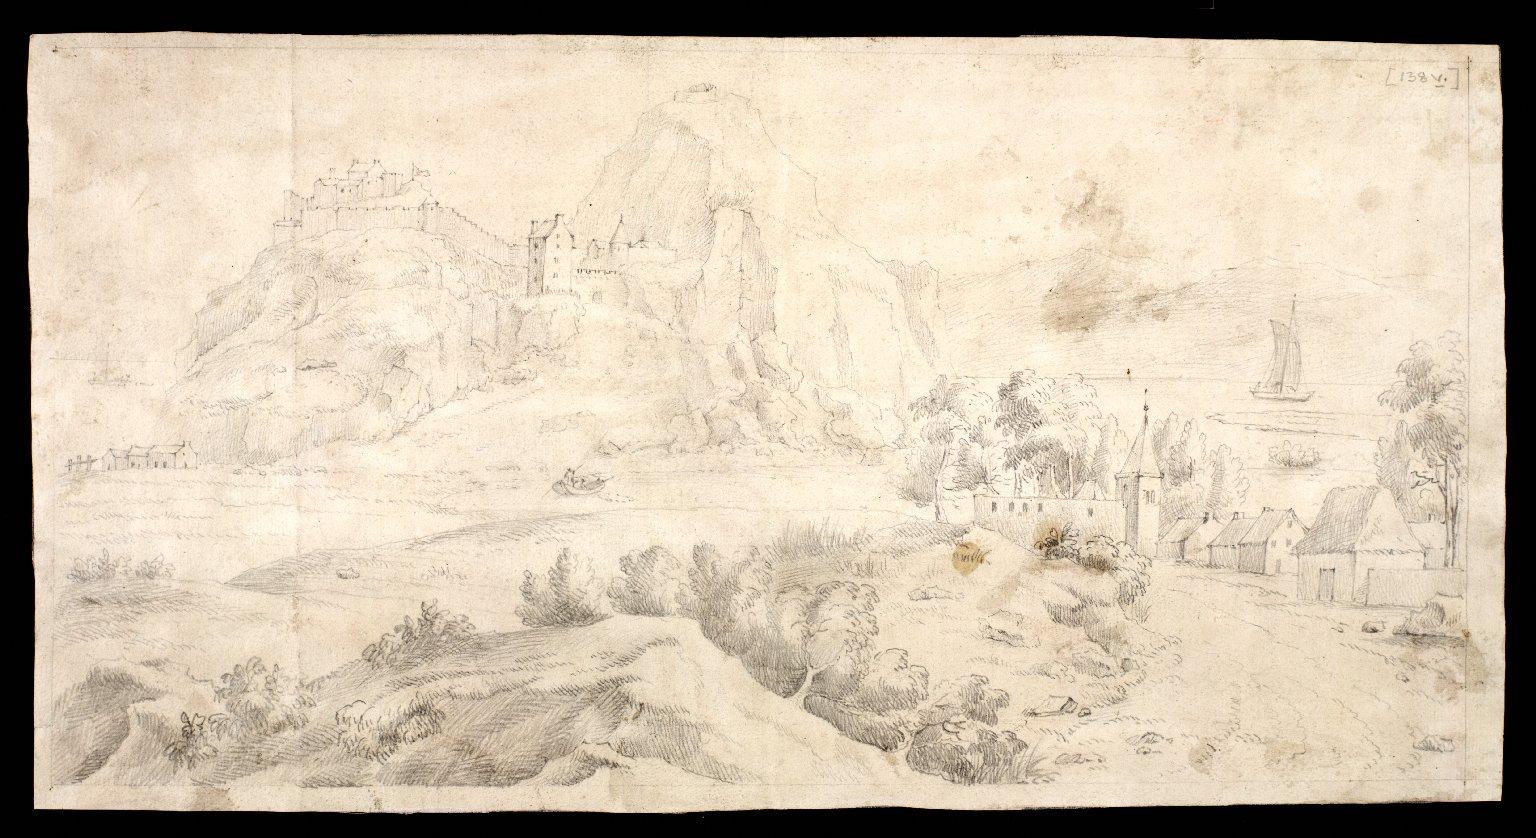 [Sketch of Dumbarton Castle] [1 of 1]